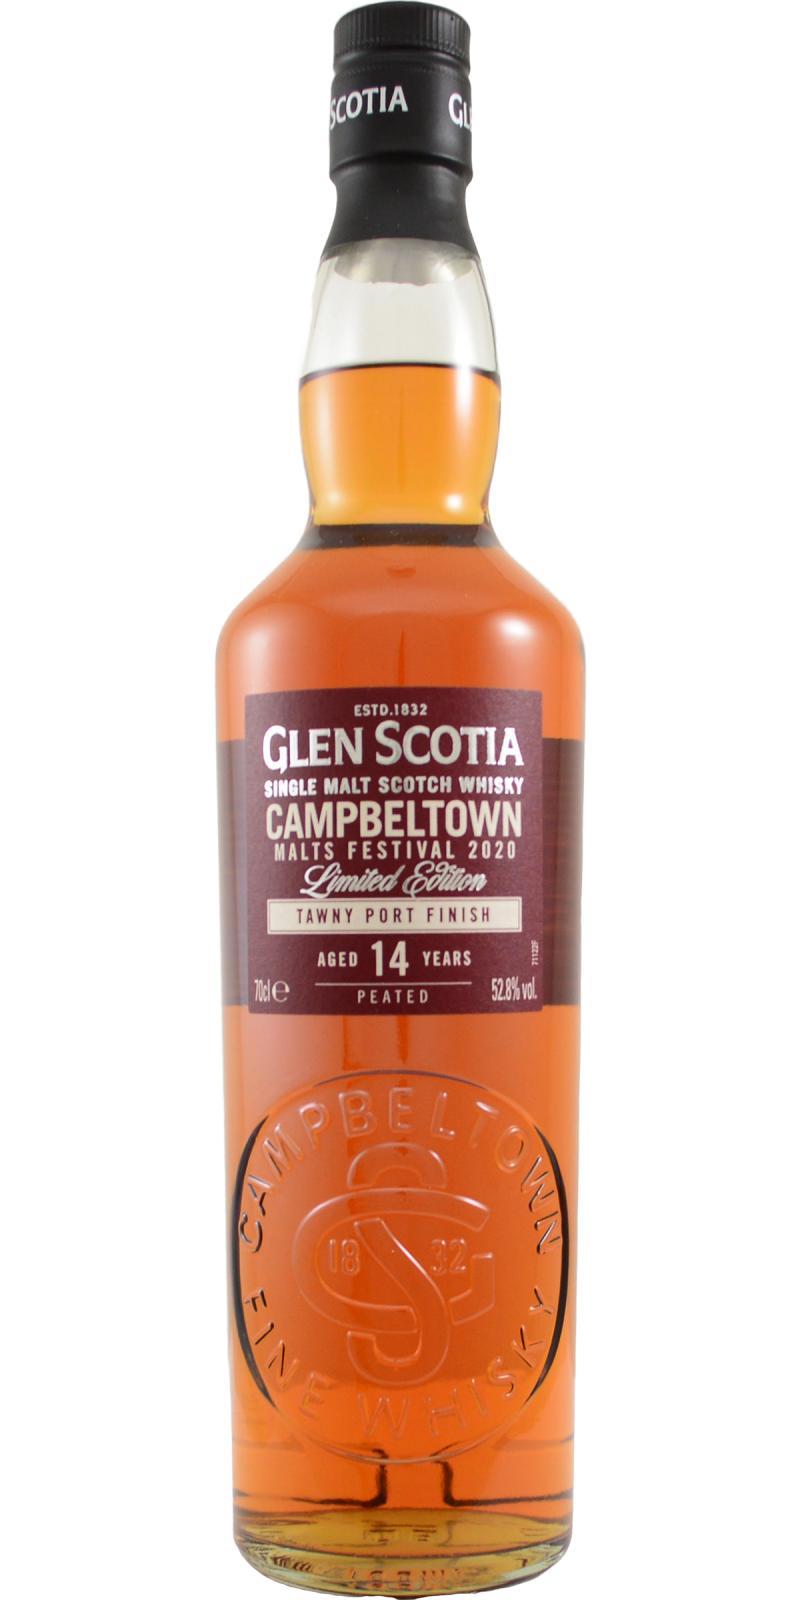 Glen Scotia 14-year-old